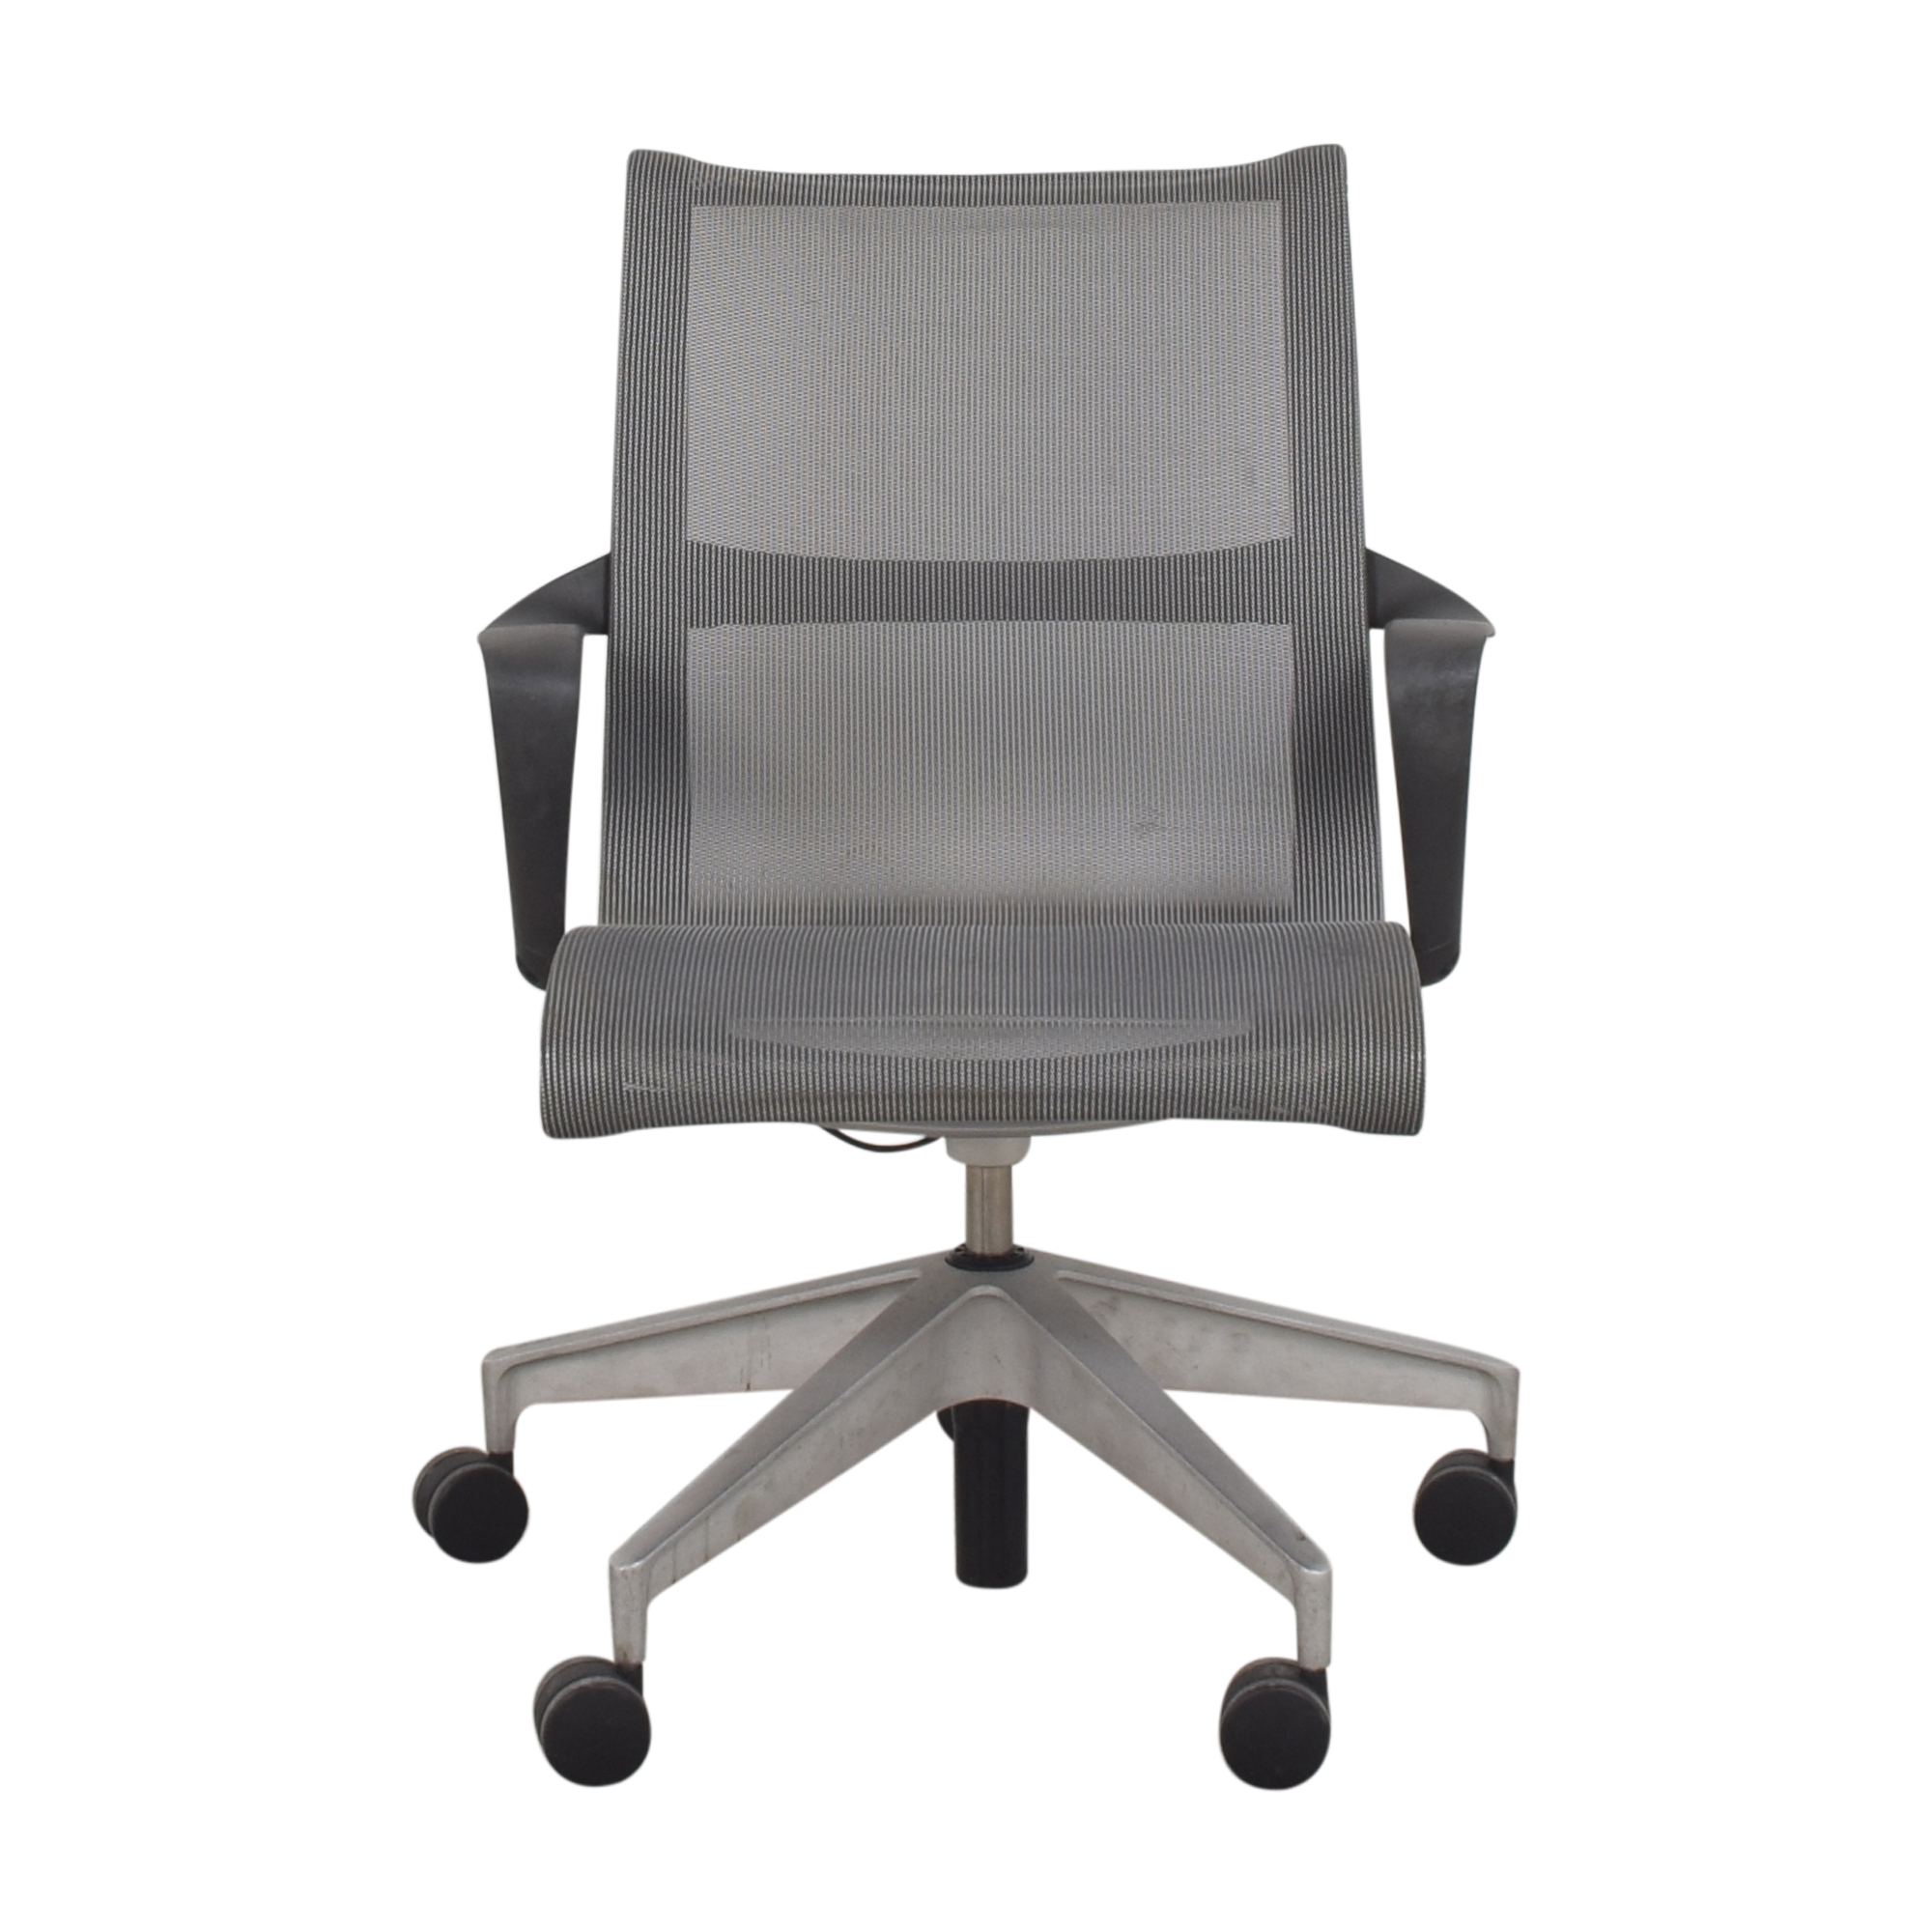 Herman Miller Herman Miller Setu Chair dimensions